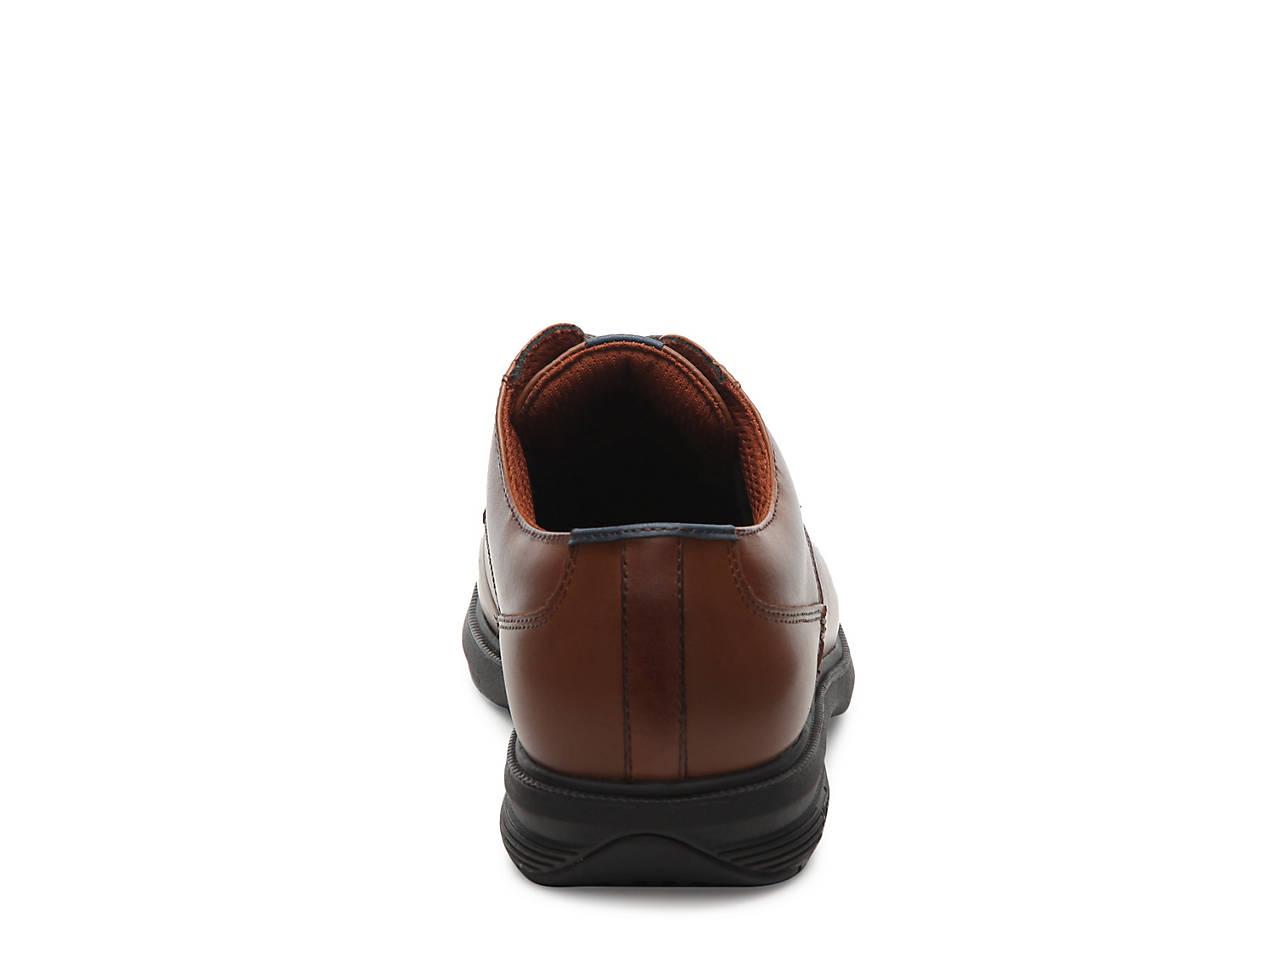 dae0ceb0e Nunn Bush Marvin St. Oxford Men's Shoes | DSW